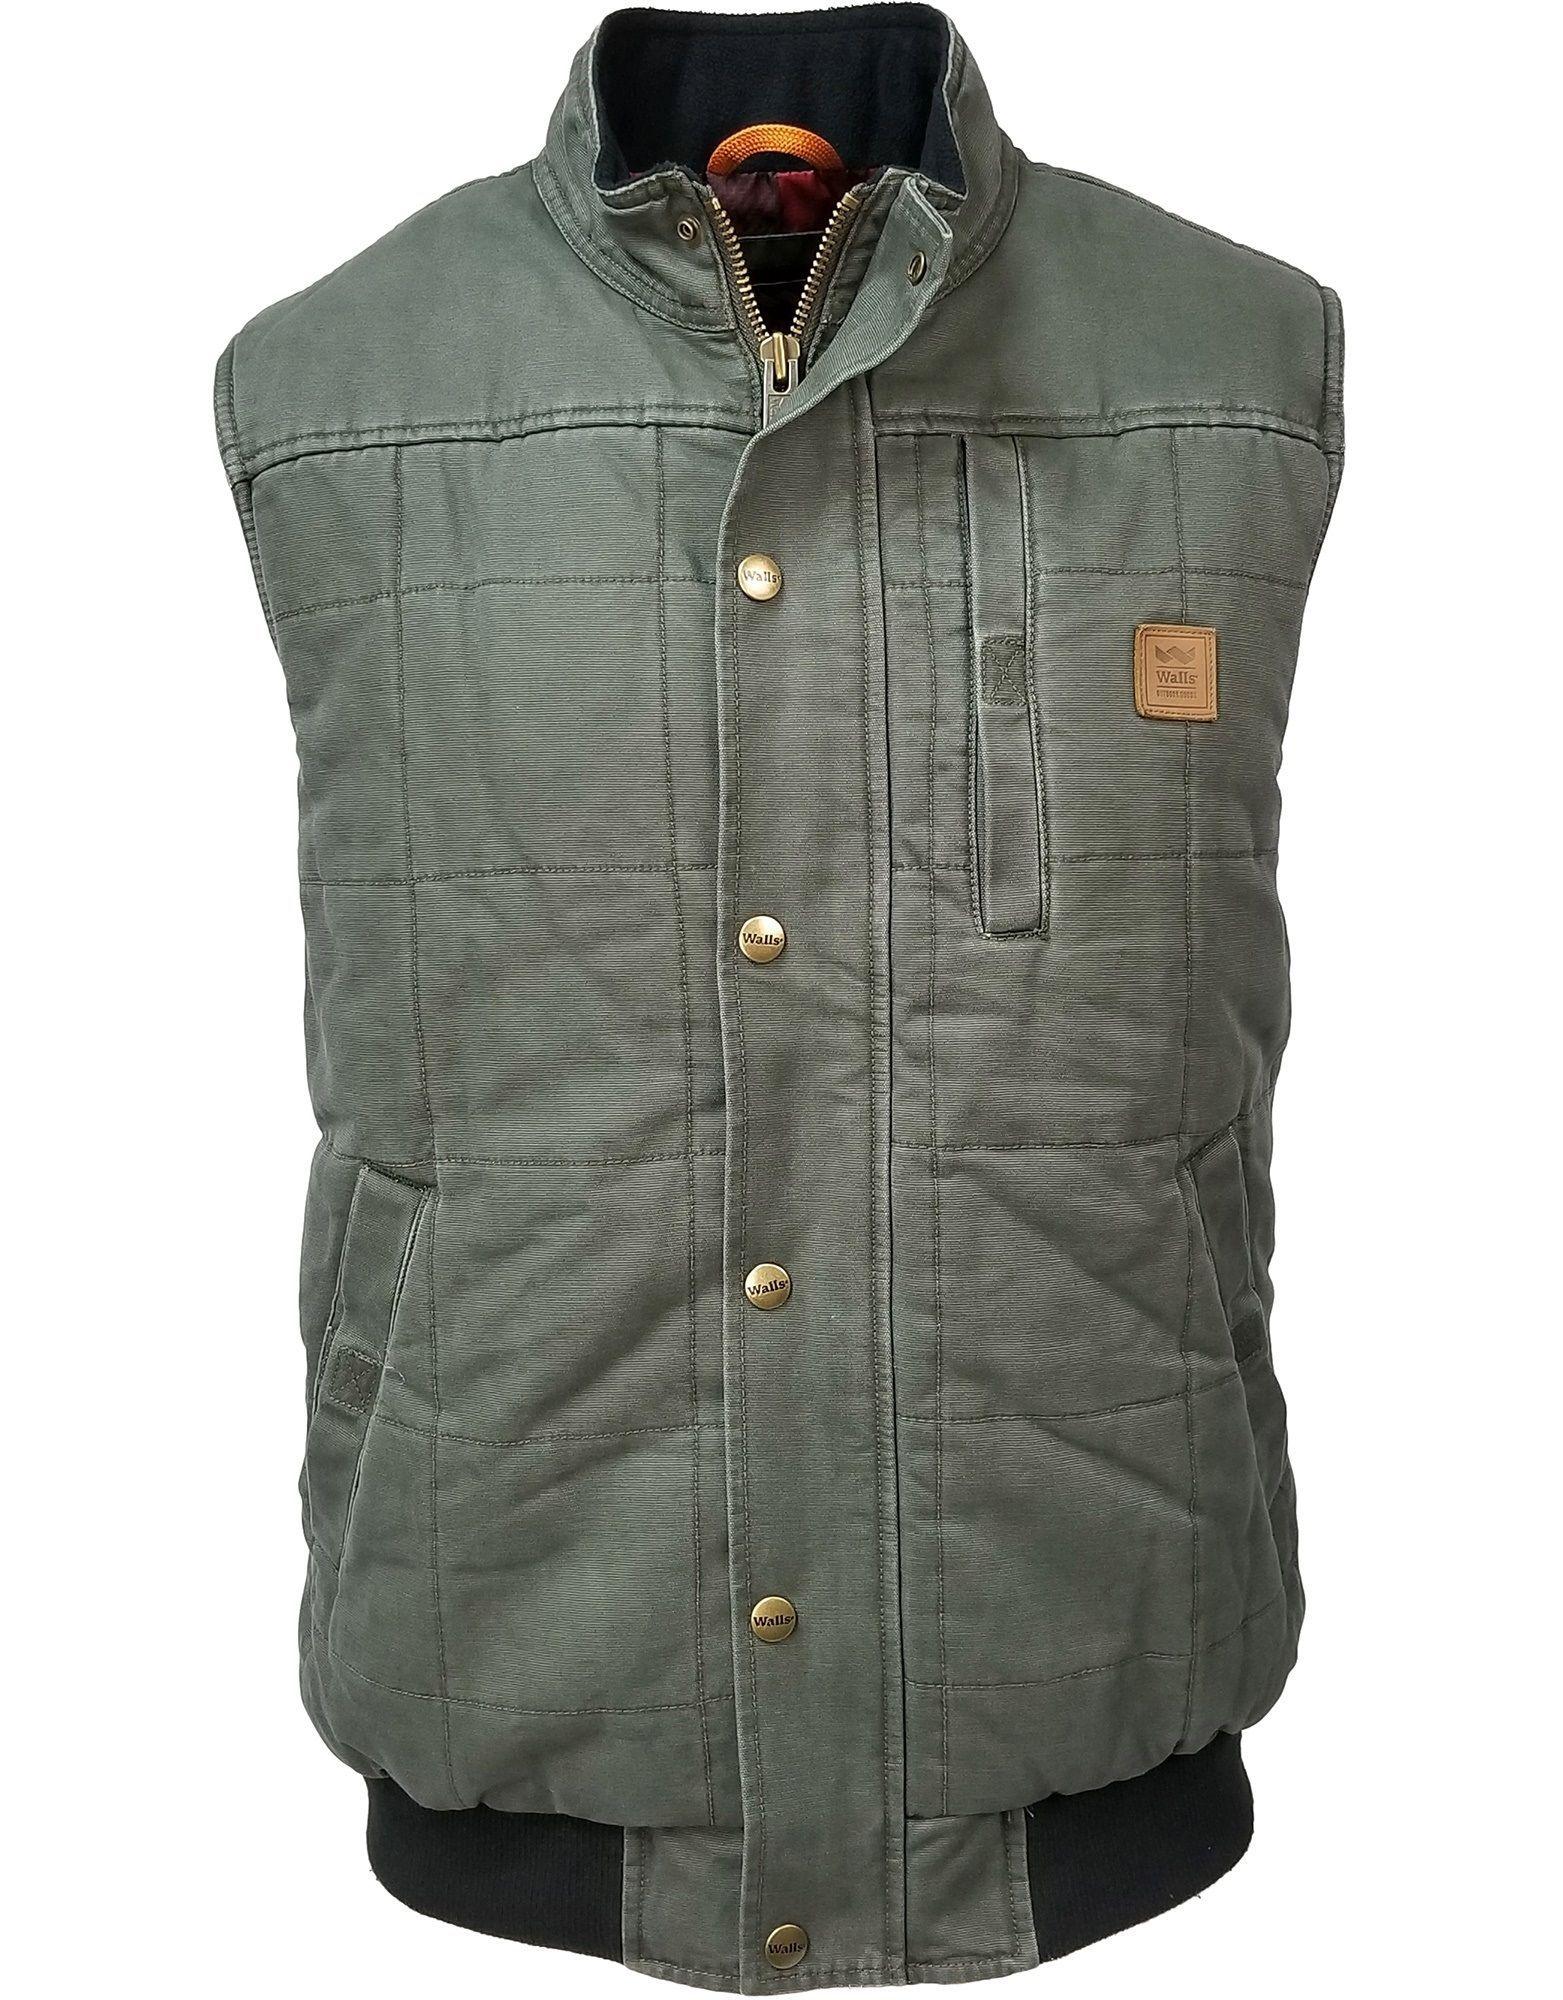 Driftwood Worn In Quilted Duck Work Vest Quilted Vest Vest